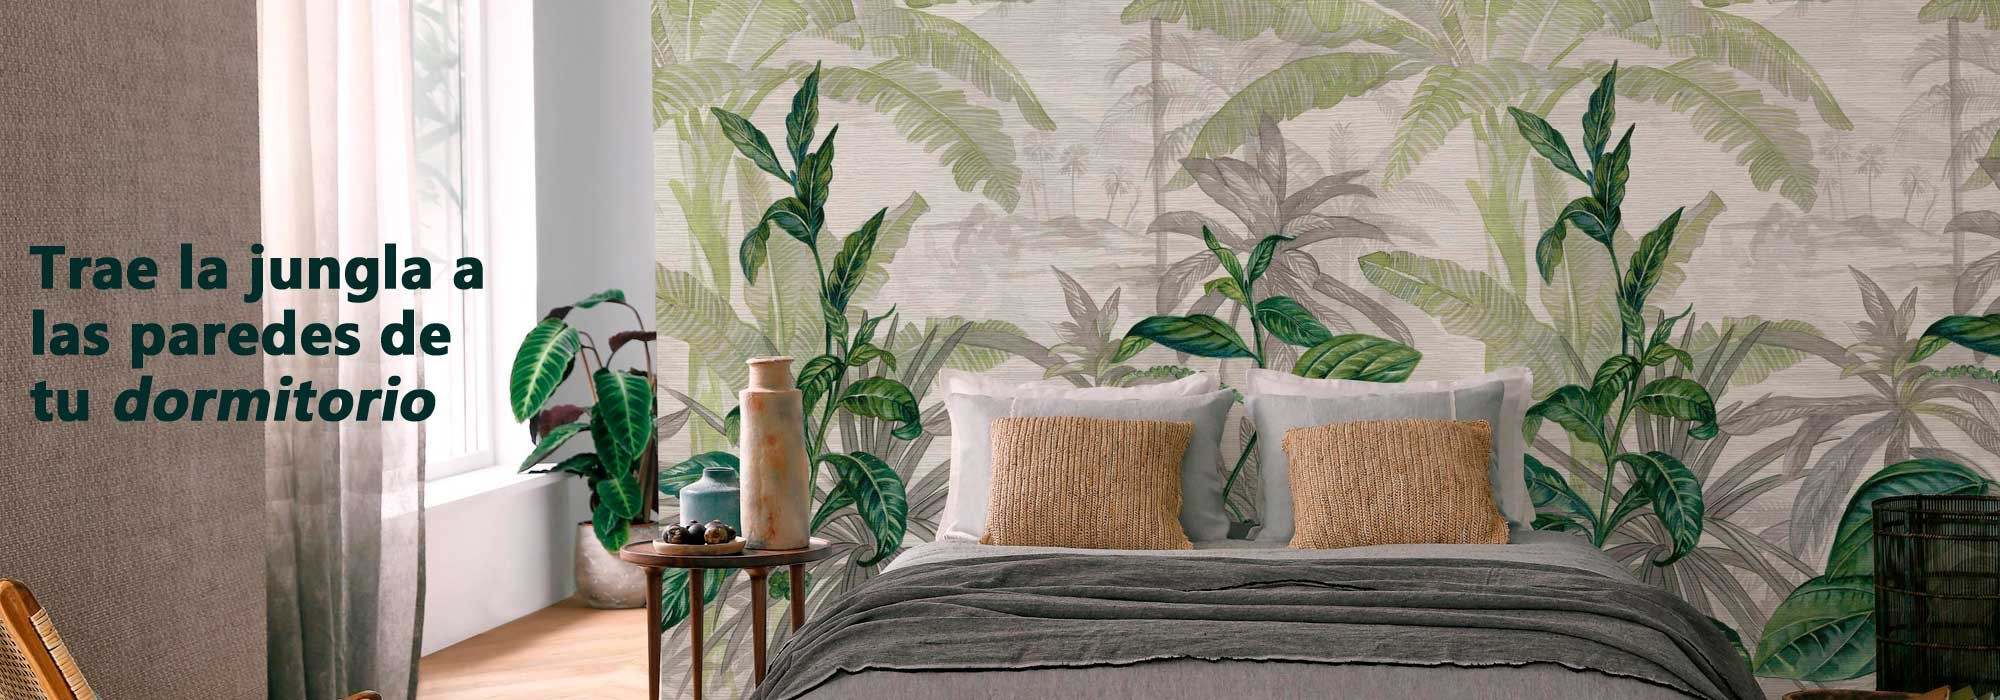 Murales Decorativos Vegetales, Florales, Tropicales